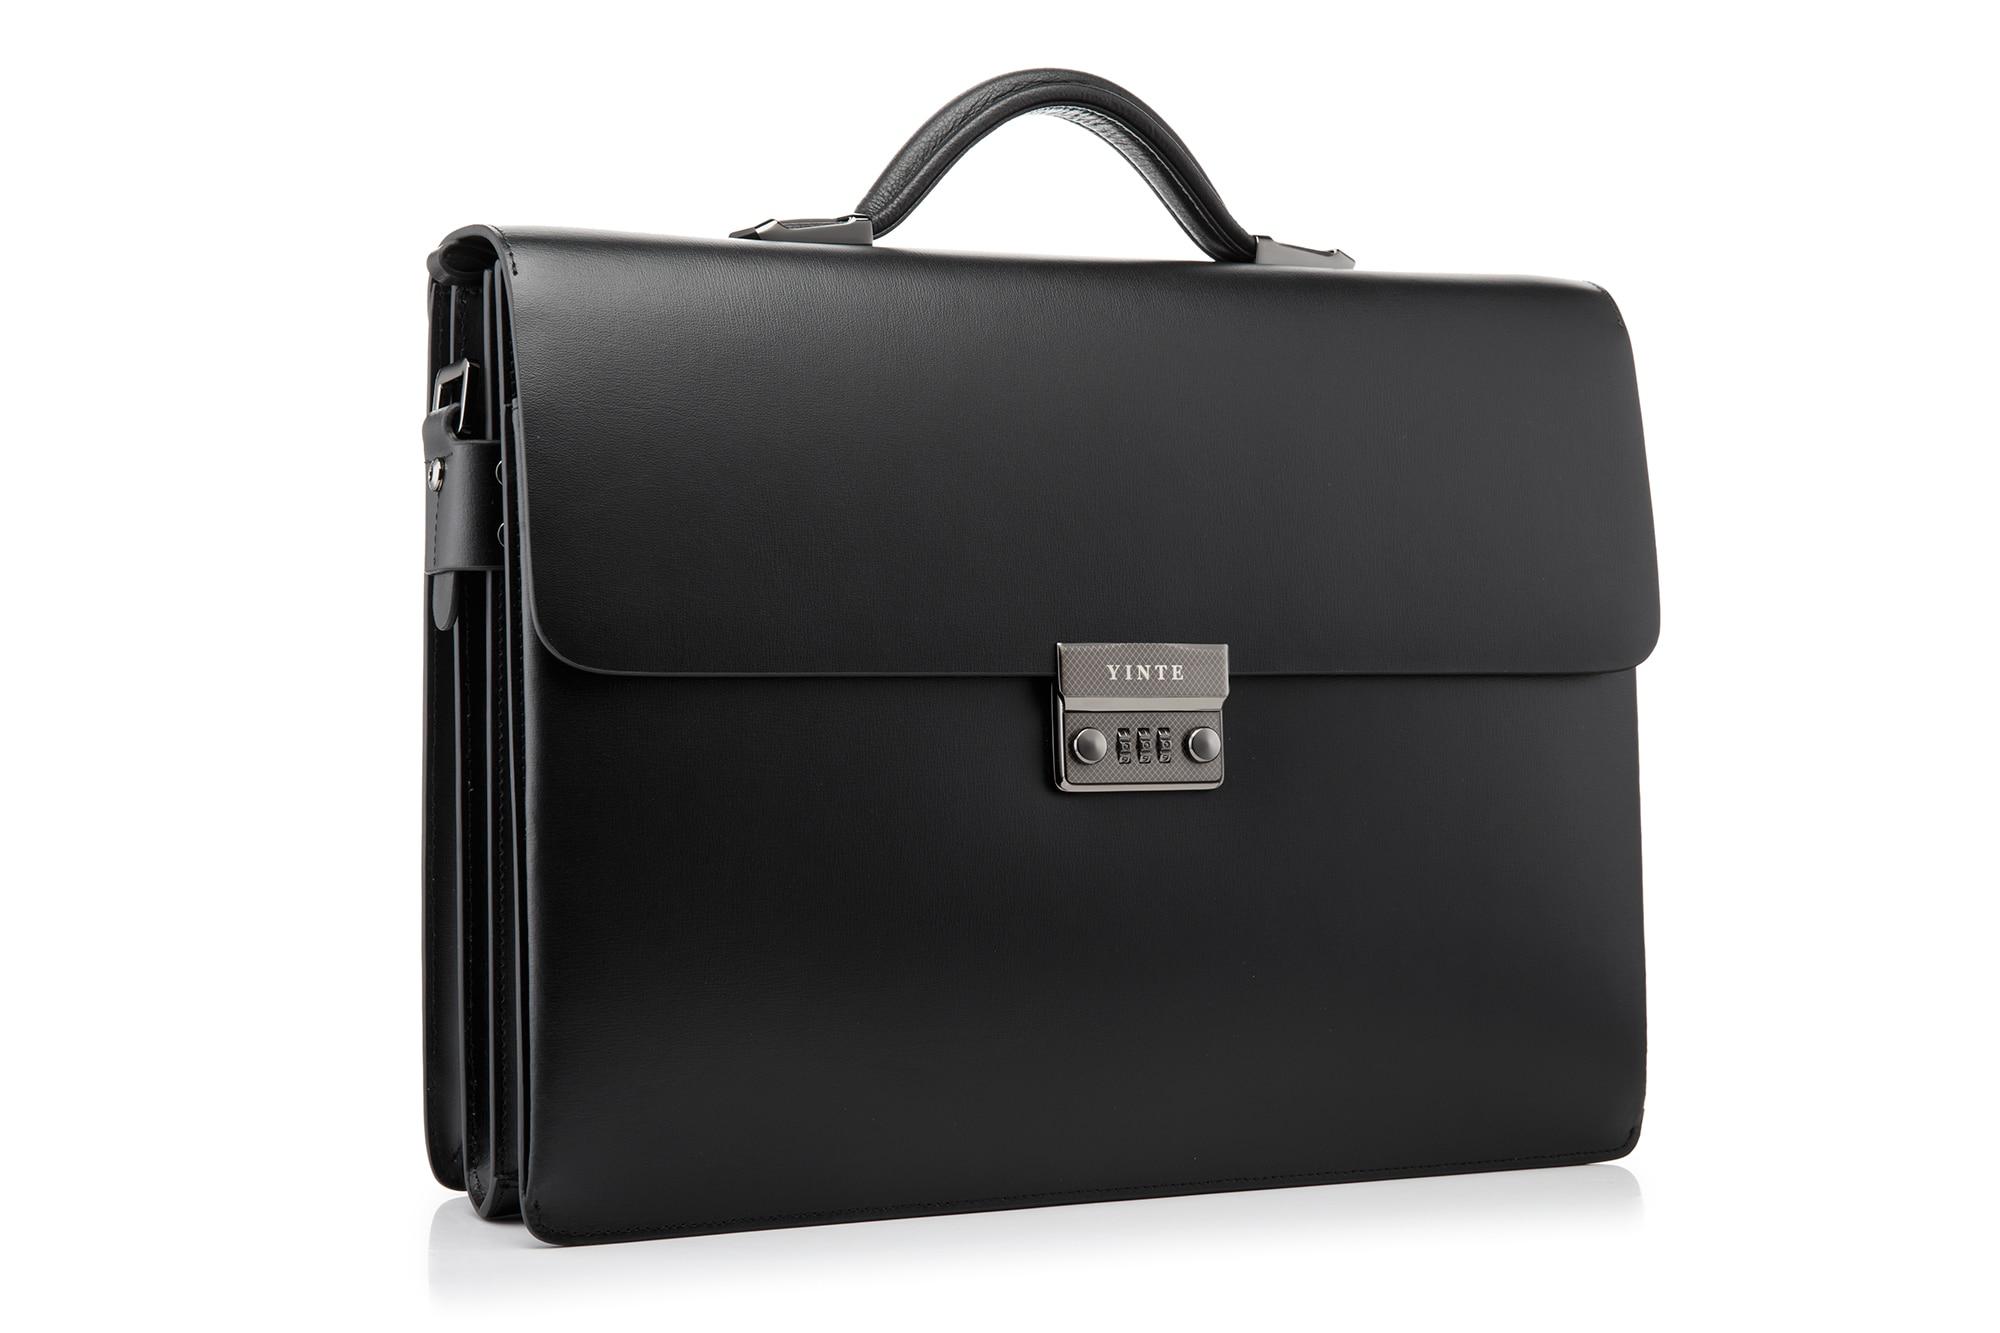 YINTE kožna crna torba muška aktovka velika i deblja torba torbica - Aktovke - Foto 2